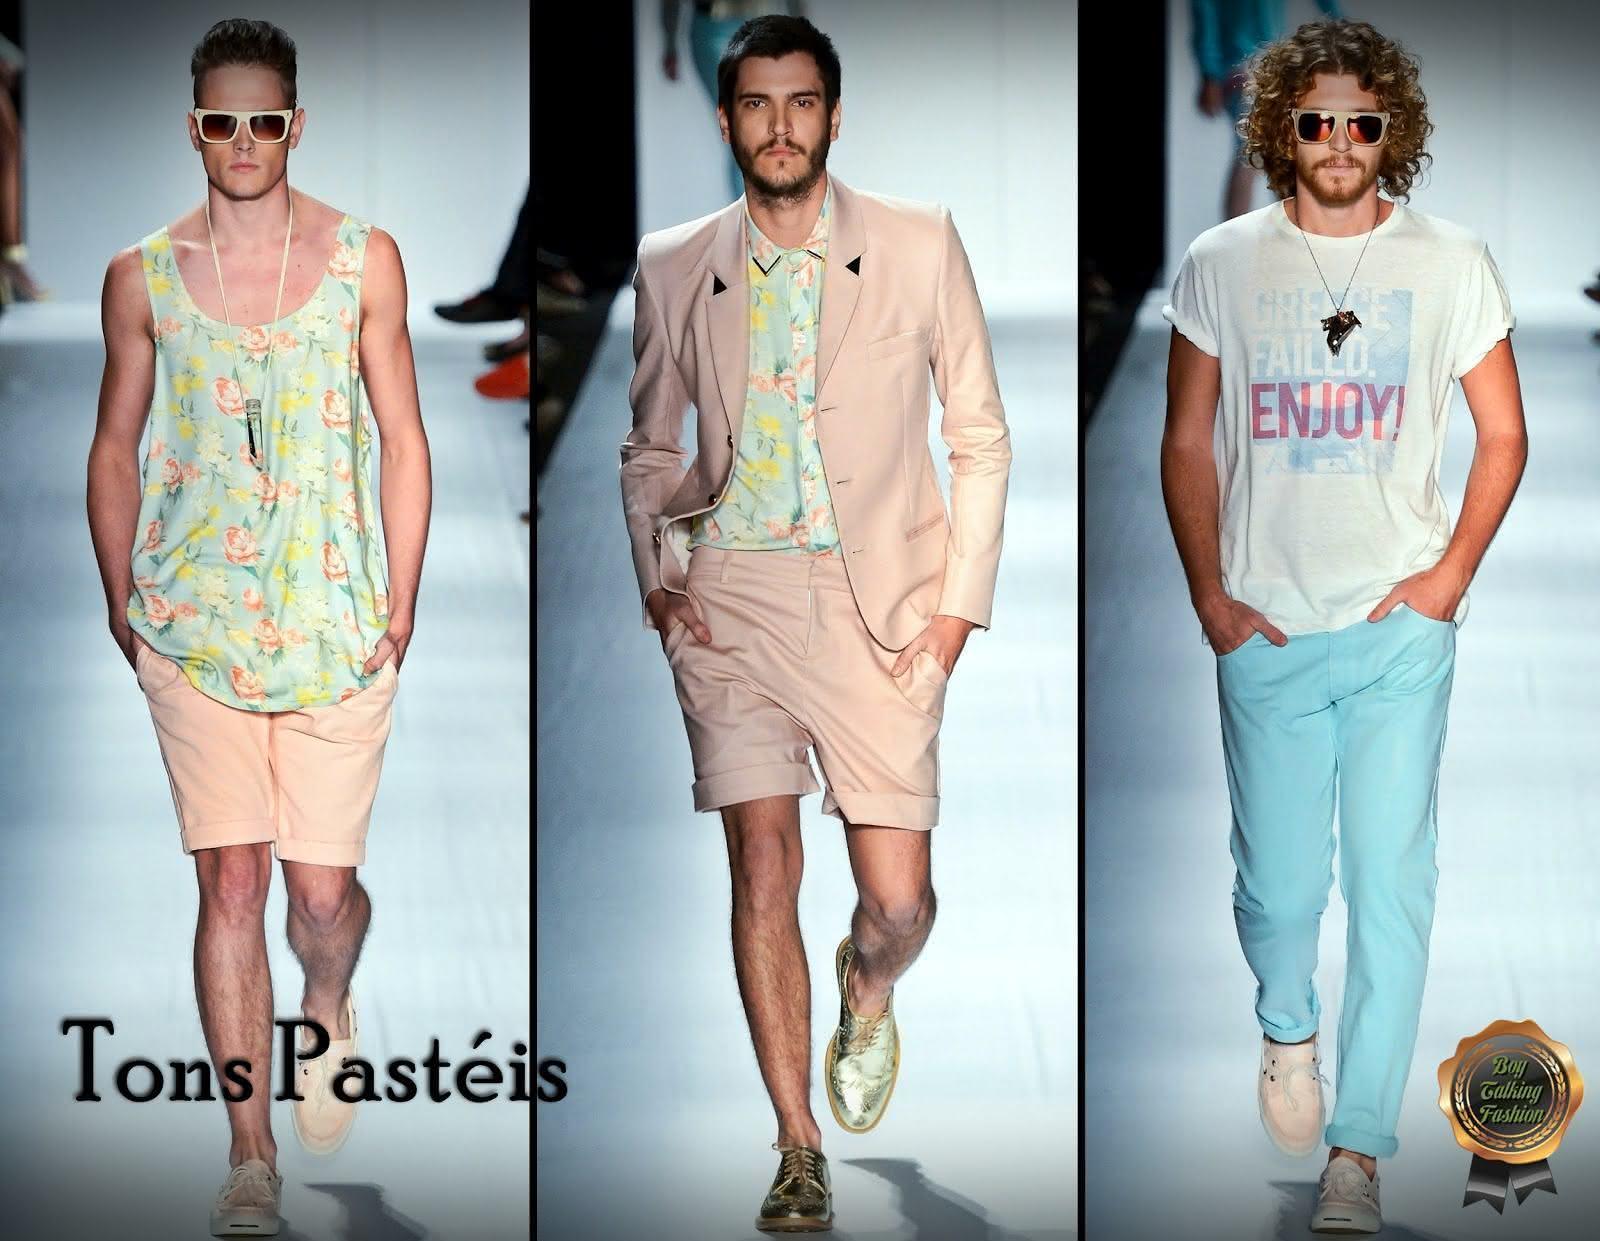 Tendências Primavera Verão 2012-2013 - Tons Pastéis - Boy Talking Fashion - Lucas Dias 2